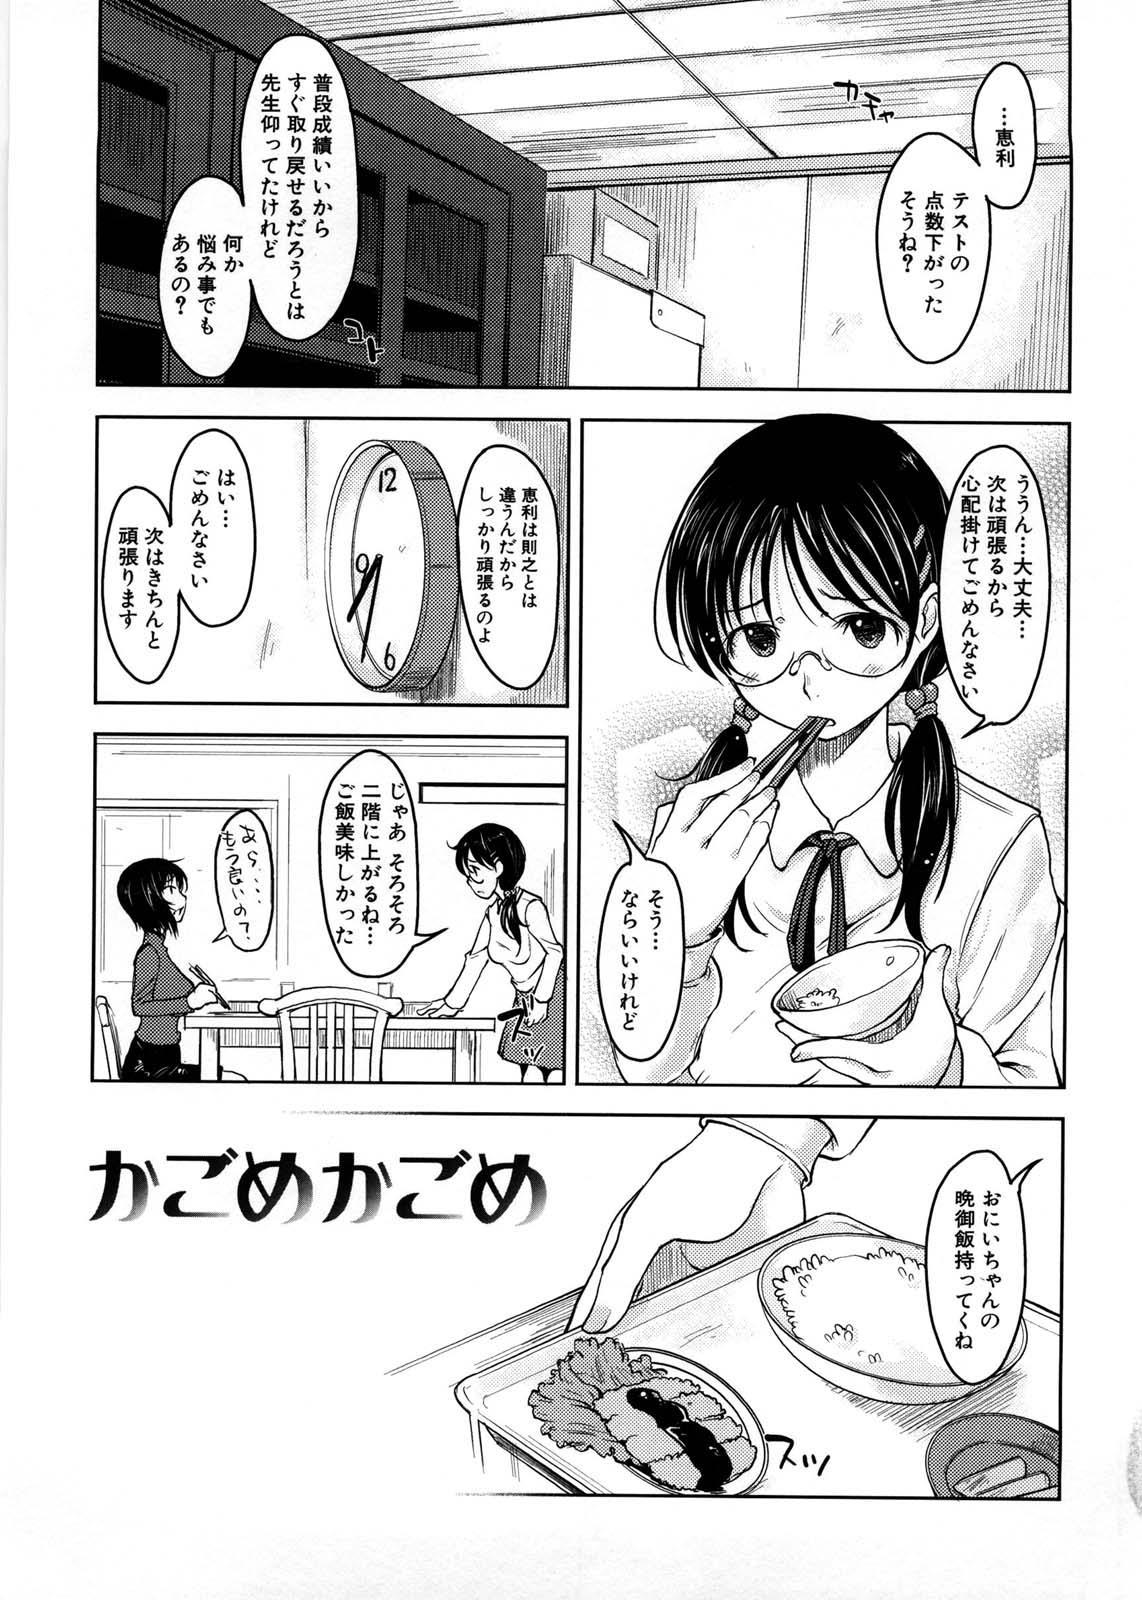 Imouto Ijou Hahaoya Miman 27